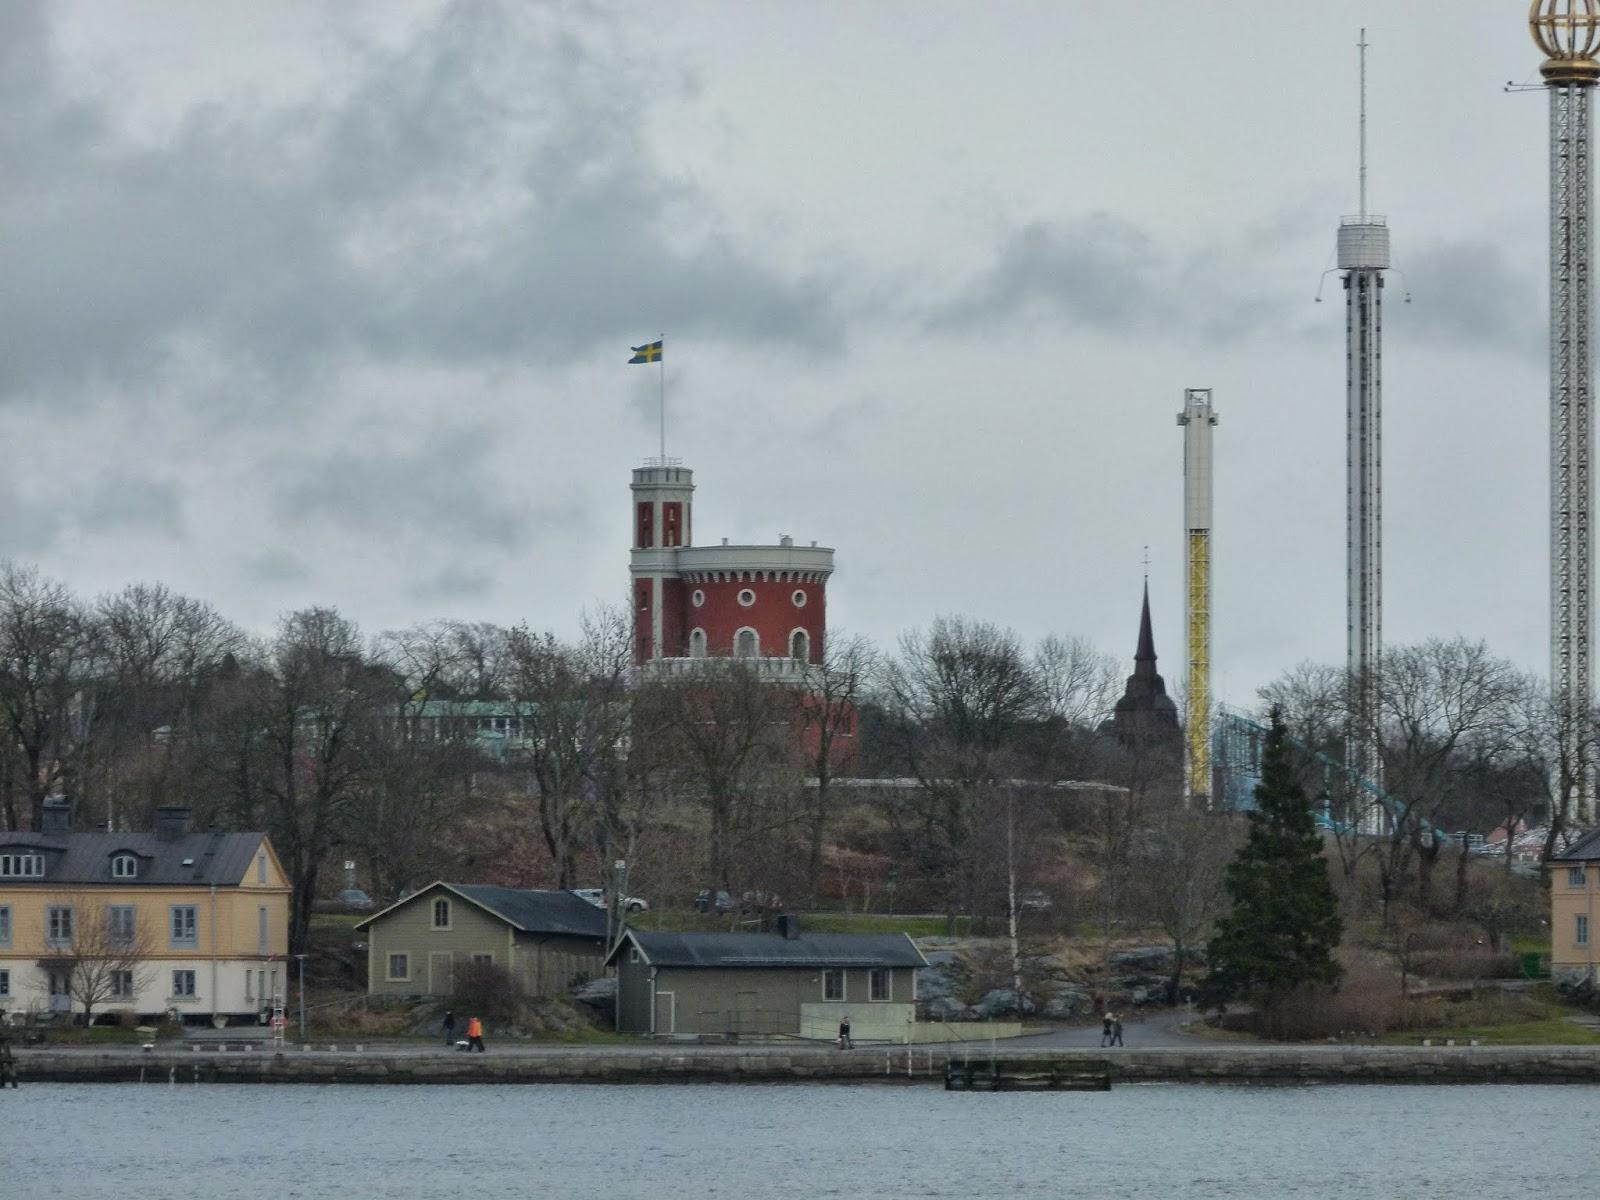 stockholm neighbourhoods östermalm djurgården